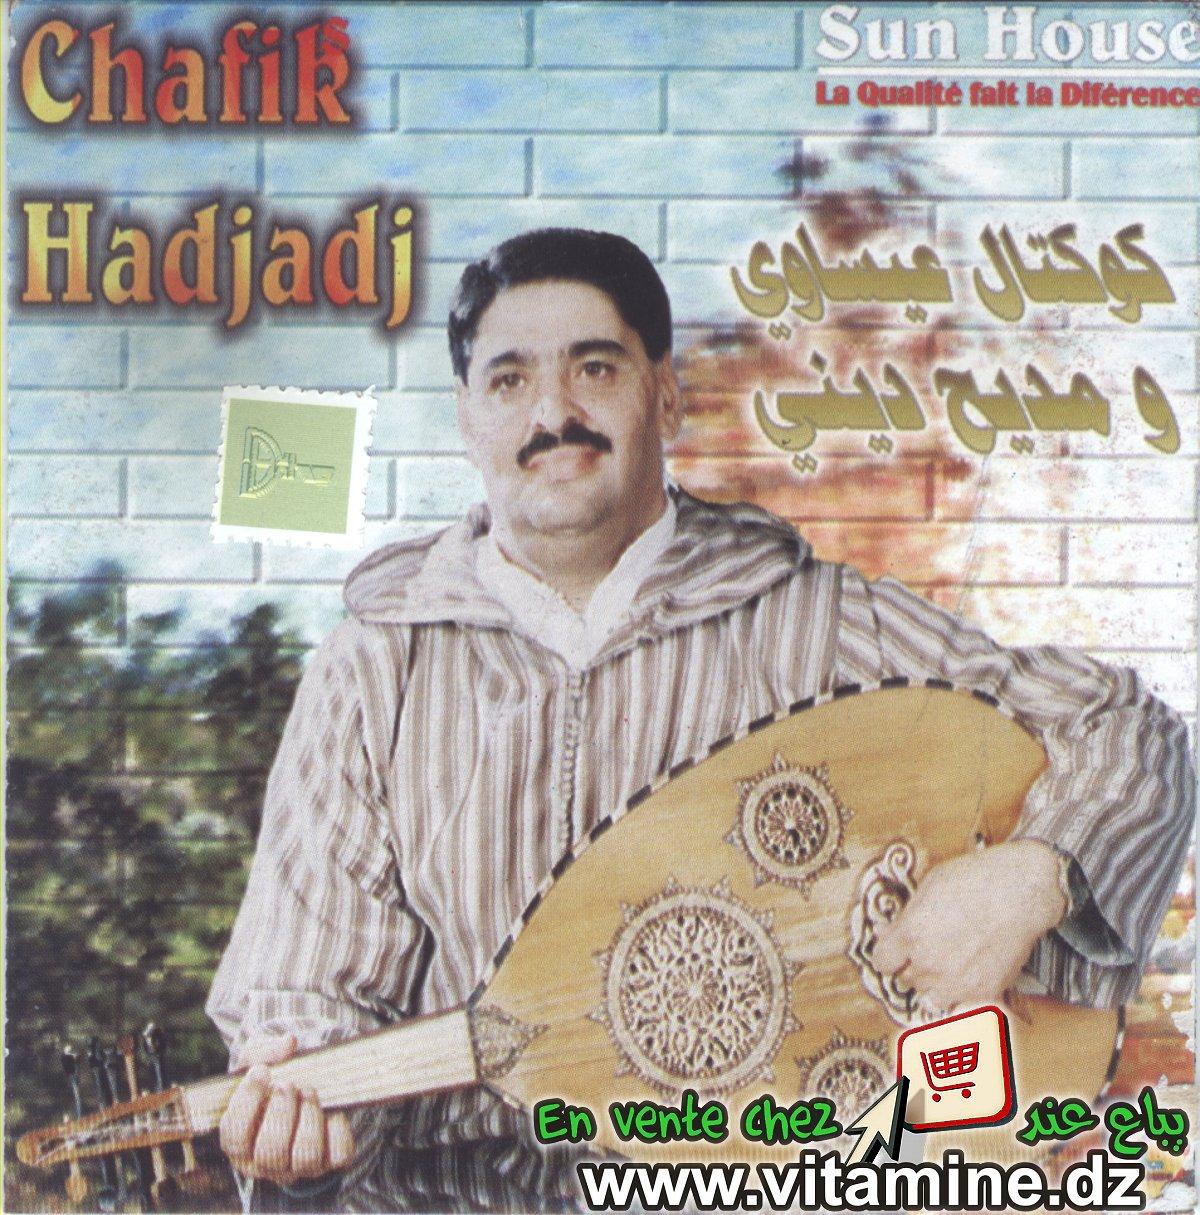 Chafik Hadjadj - Cocktail aissaoui et madih dini